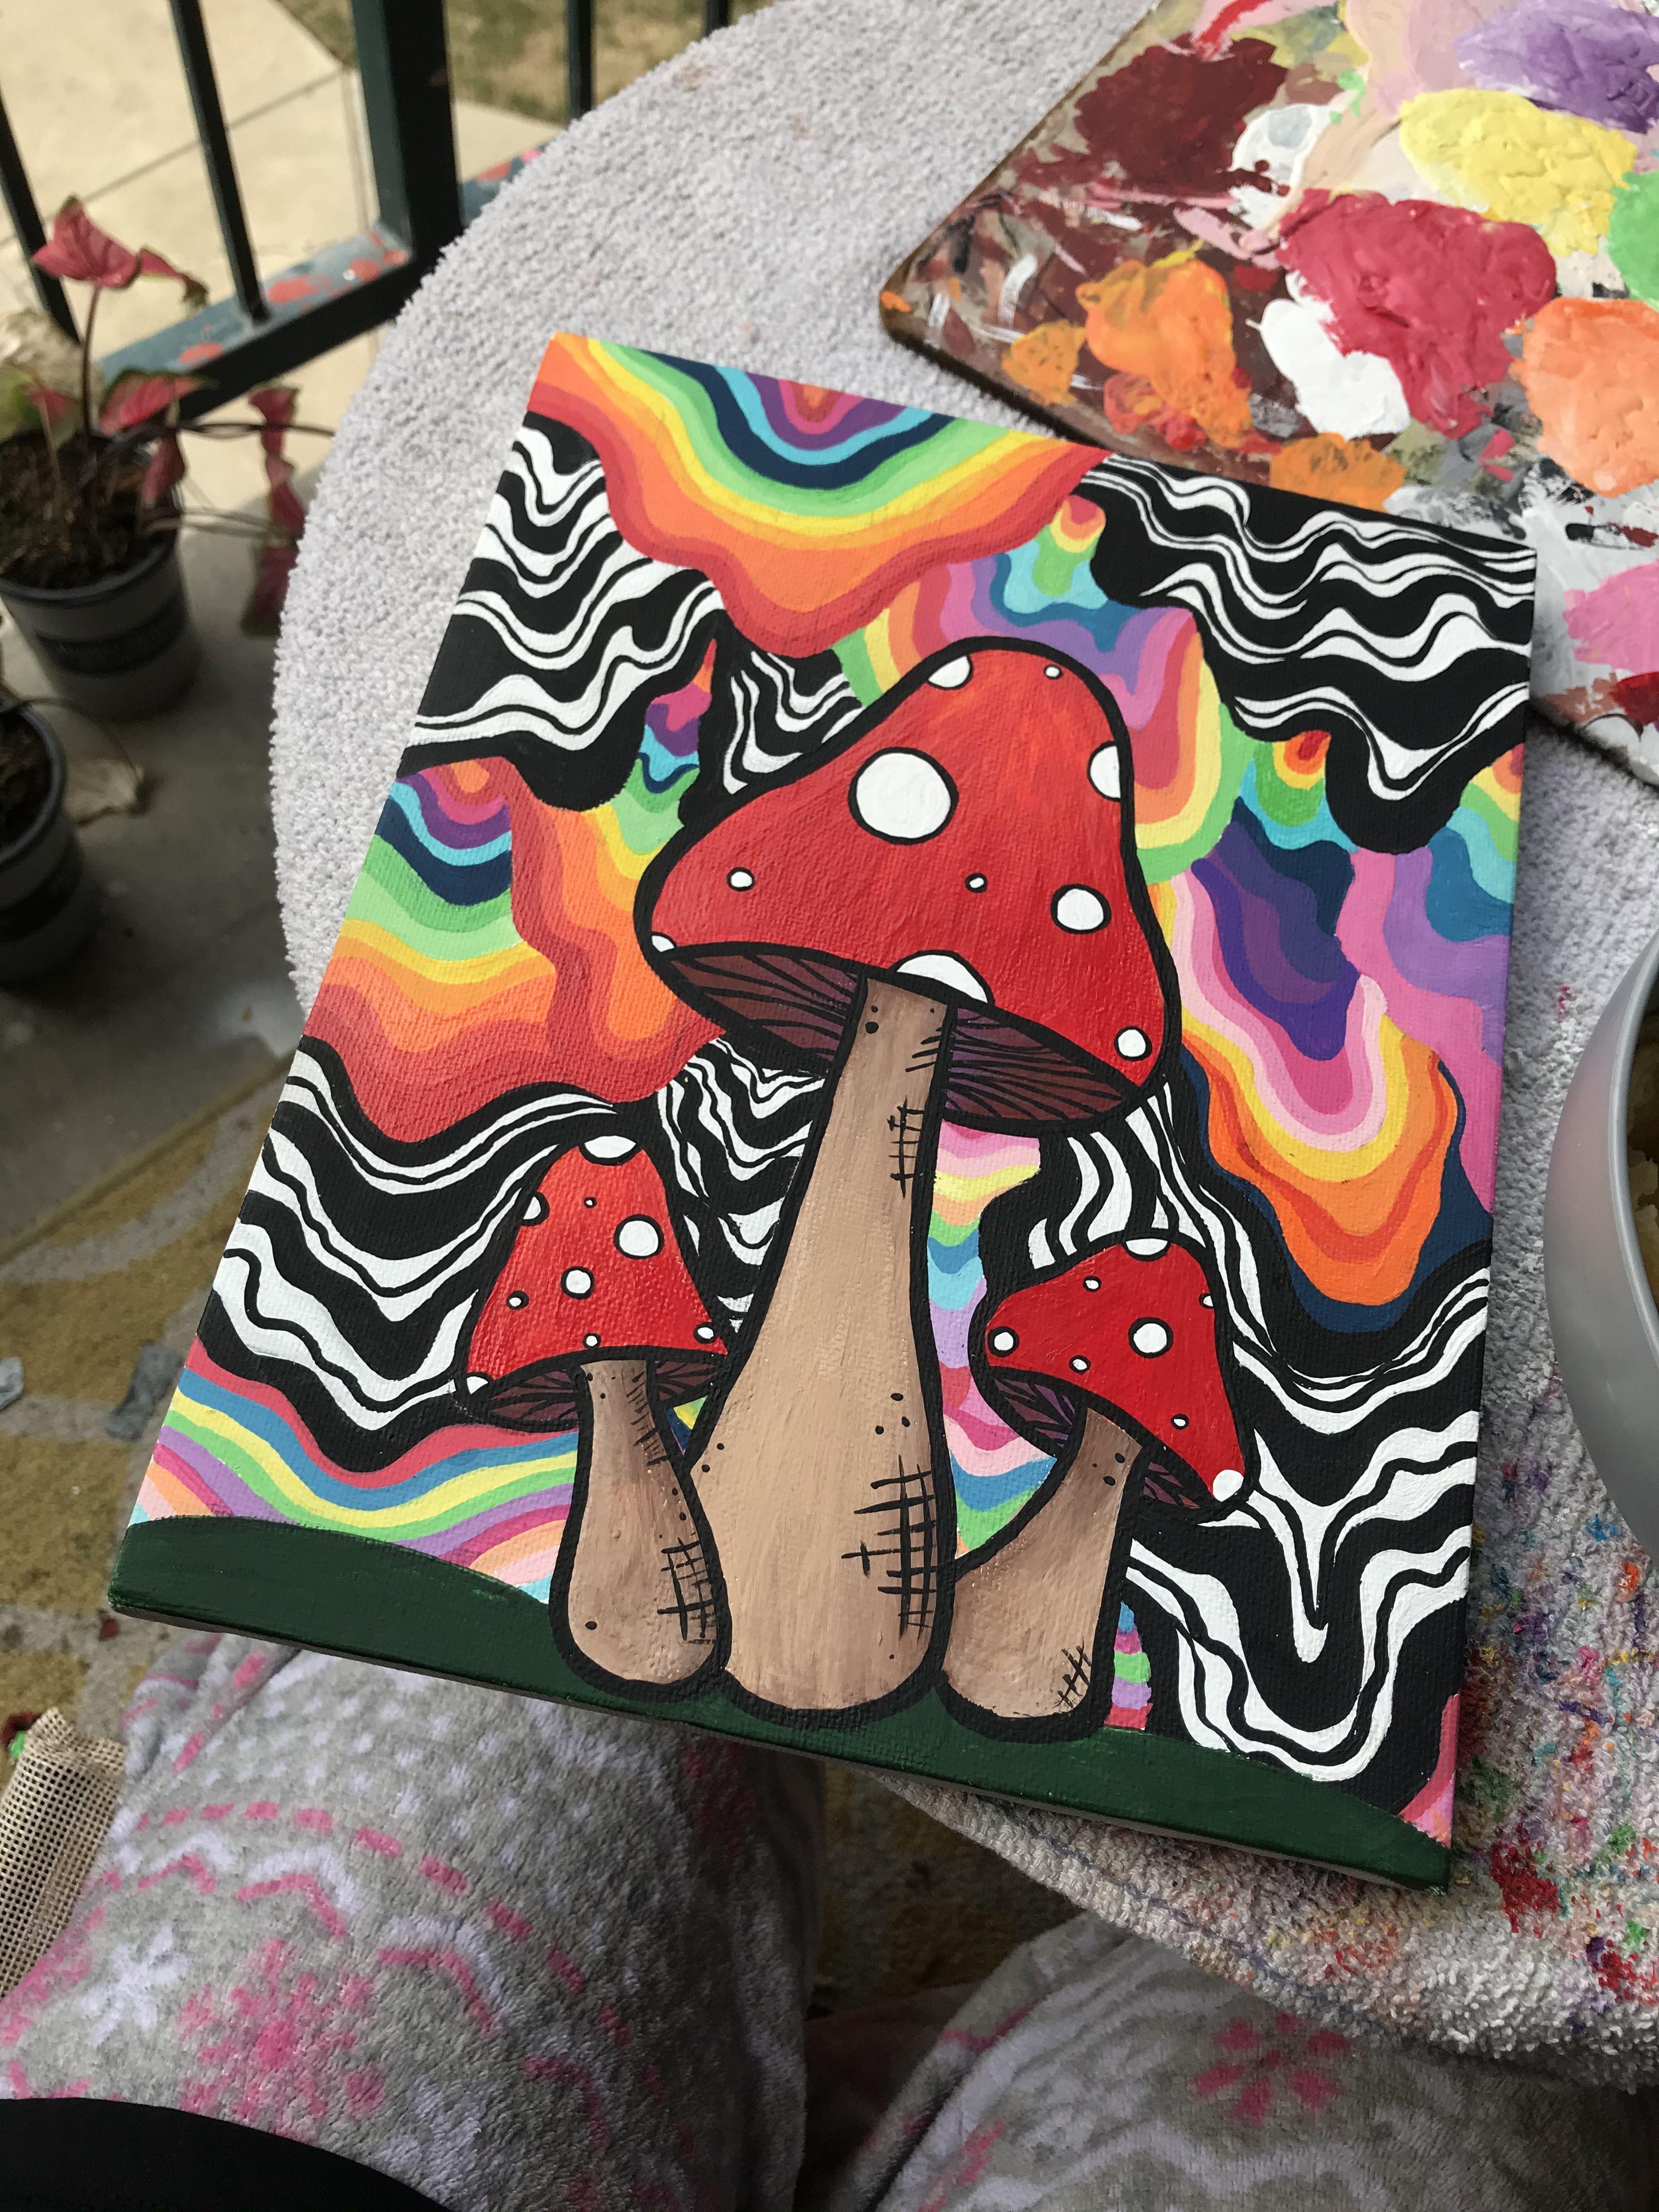 Pencil Drawings of Mushrooms | psychedelic mushrooms 2 by